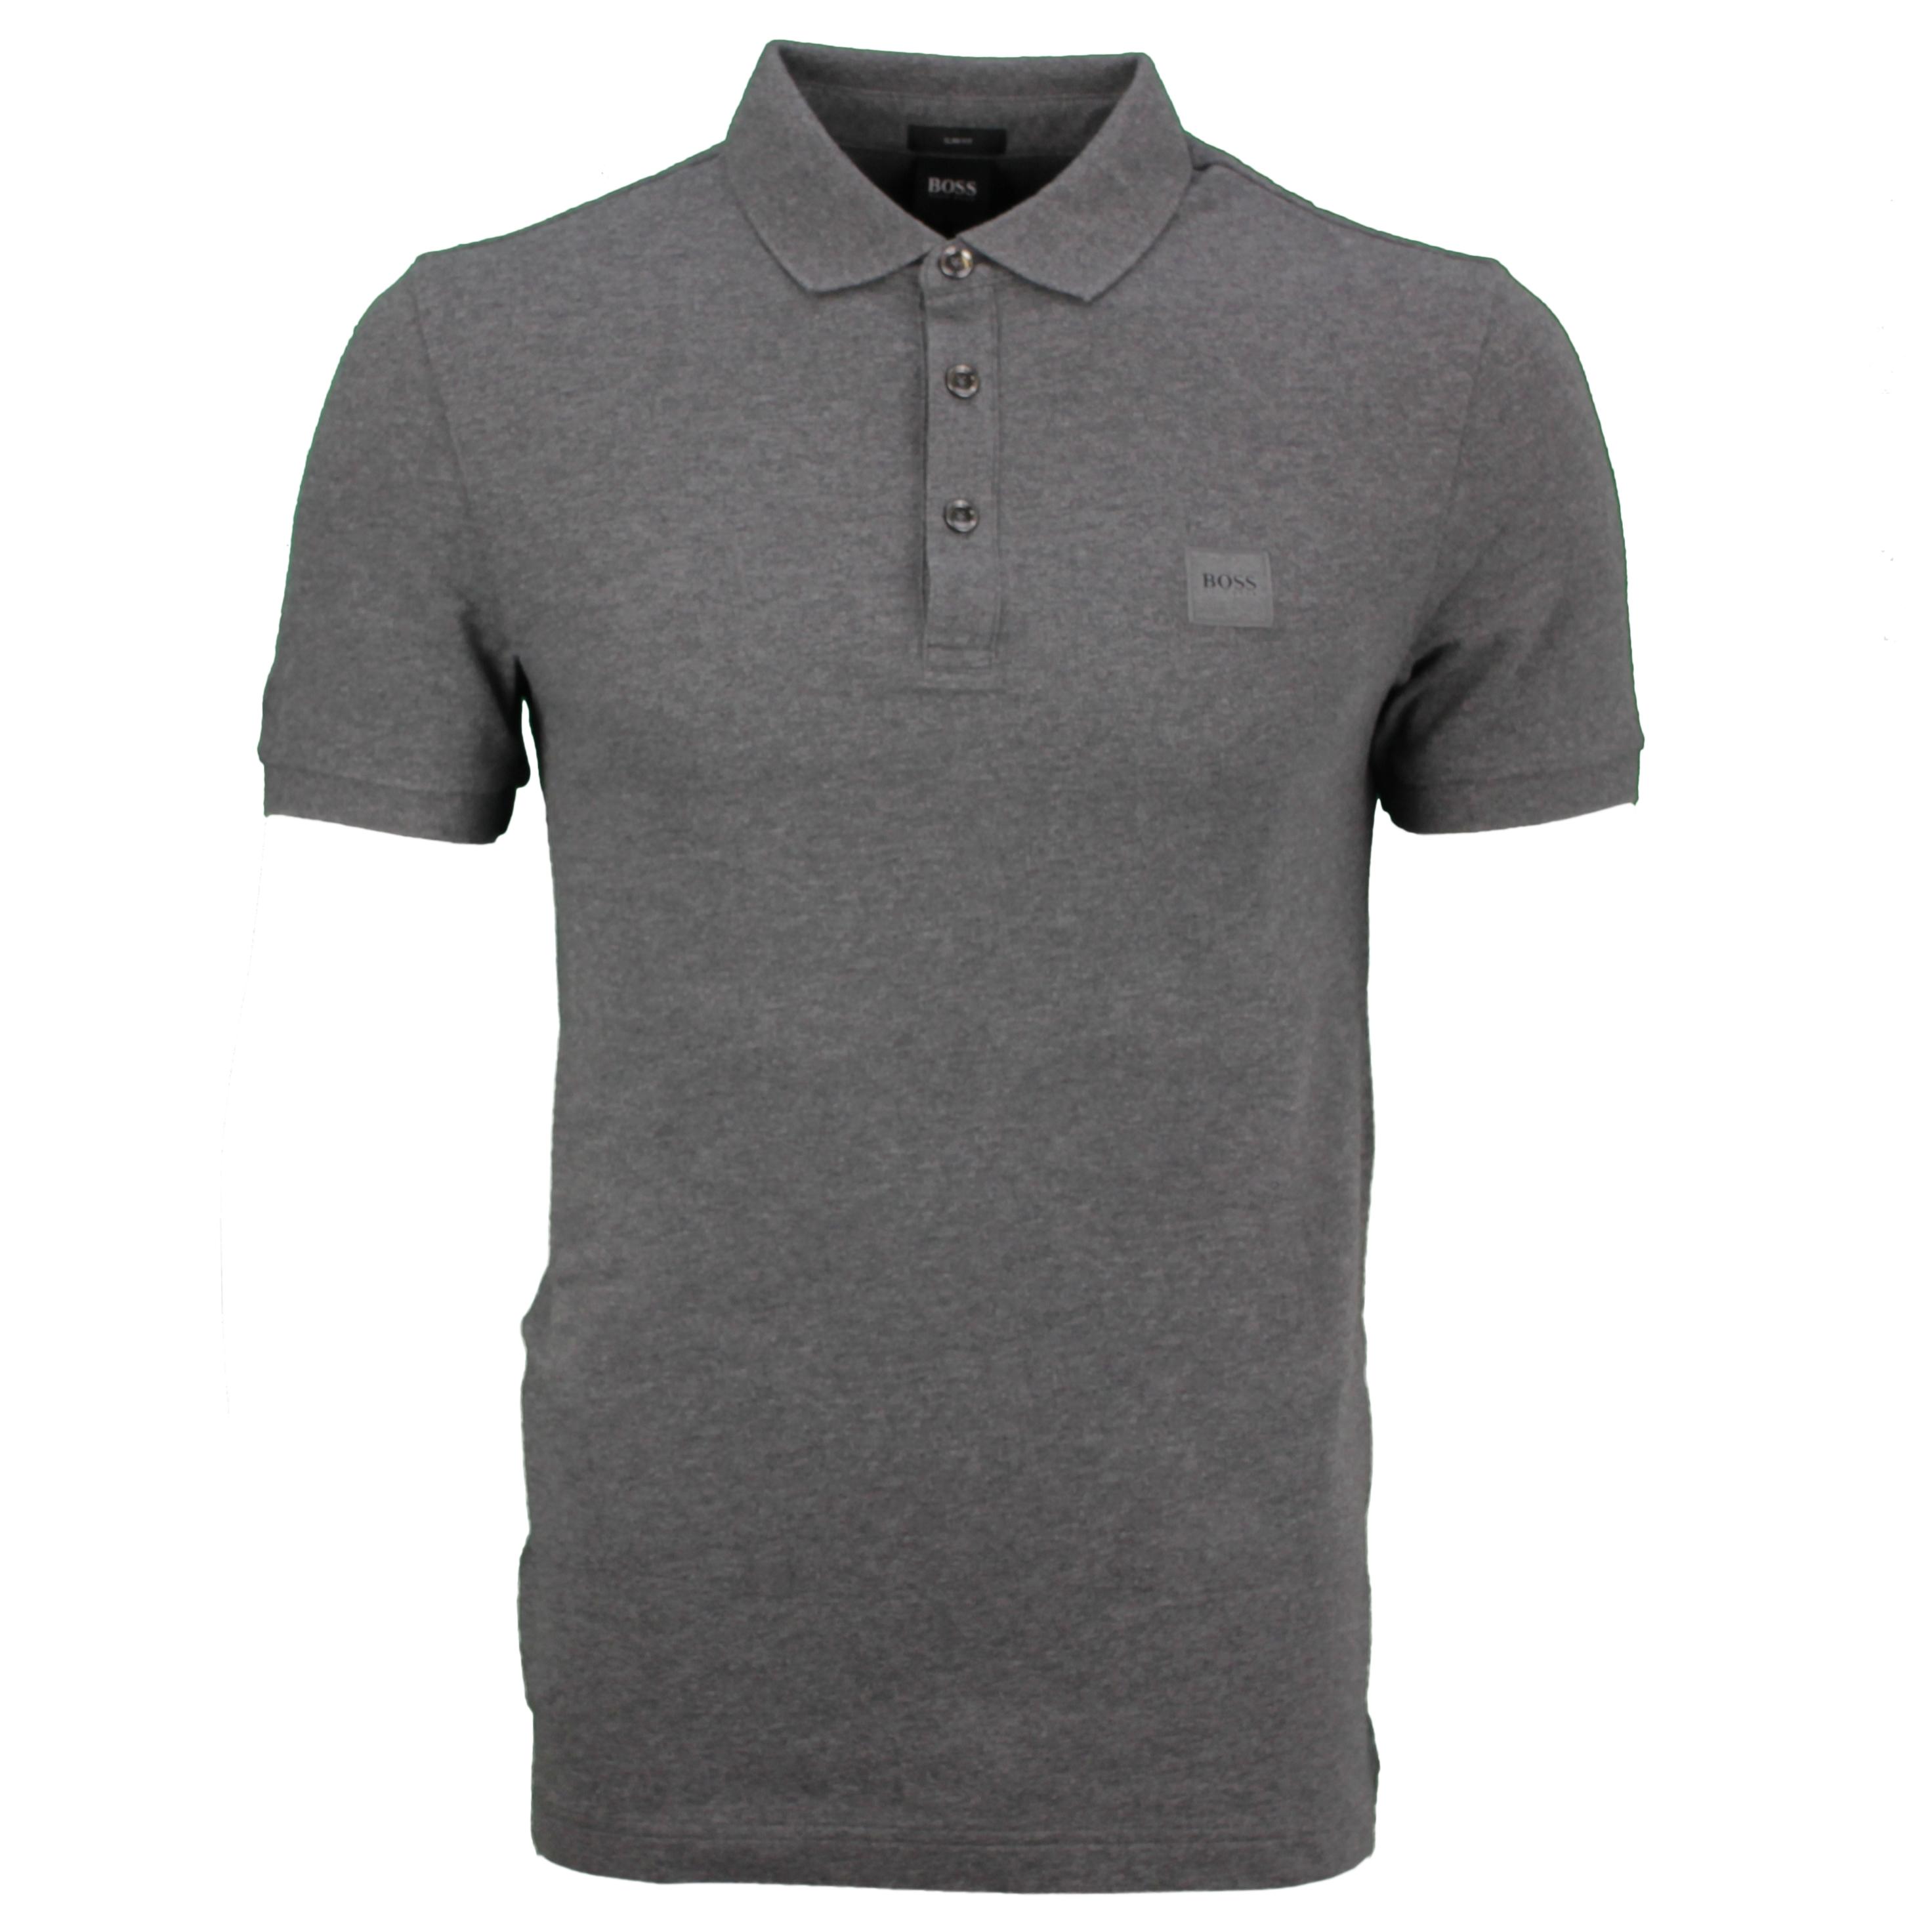 Hugo BOSS Polo Shirt dunkel grau Passenger 50378334 021